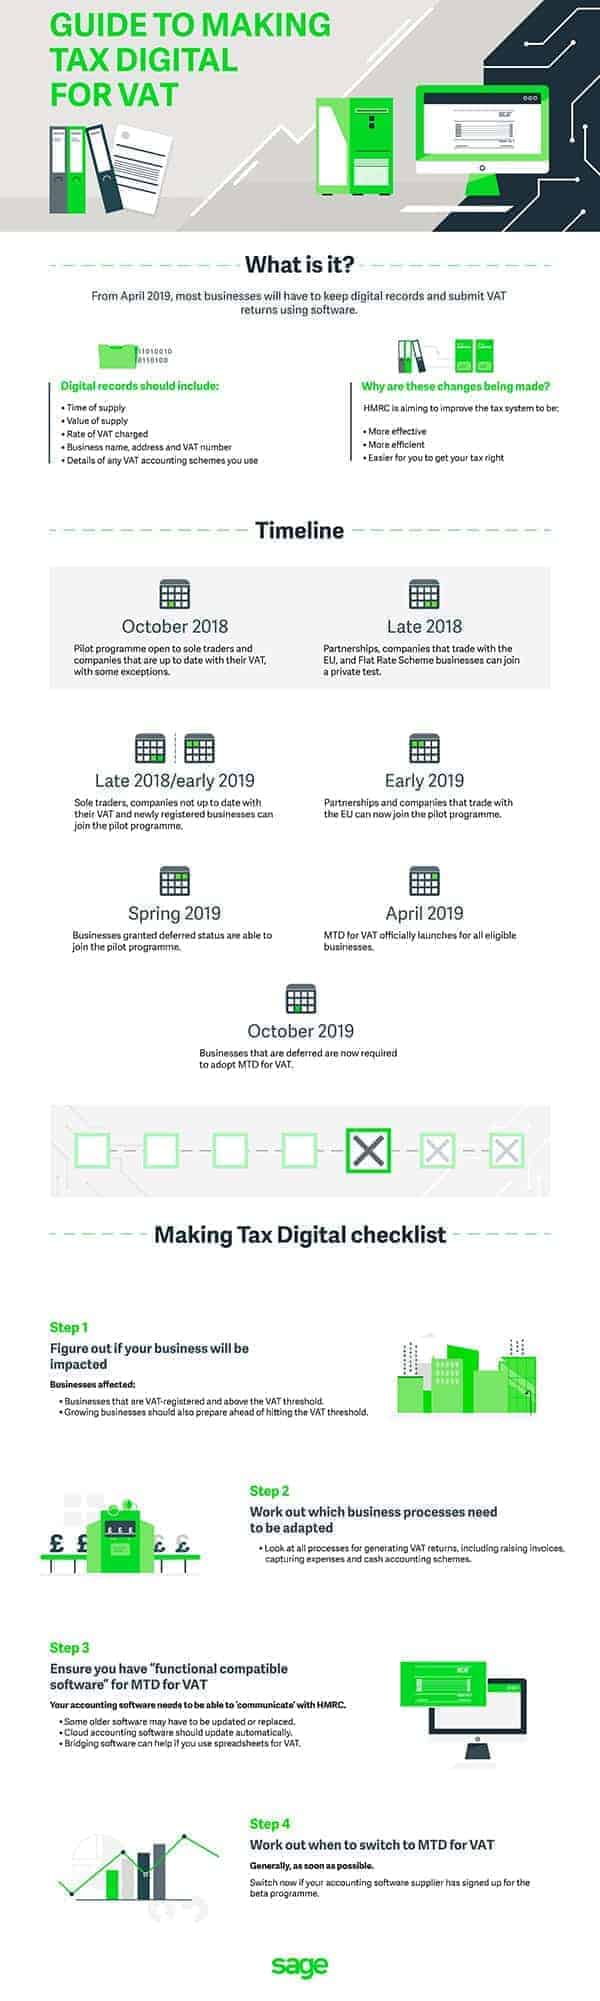 SAGE Guide to Making Tax Digital for VAT